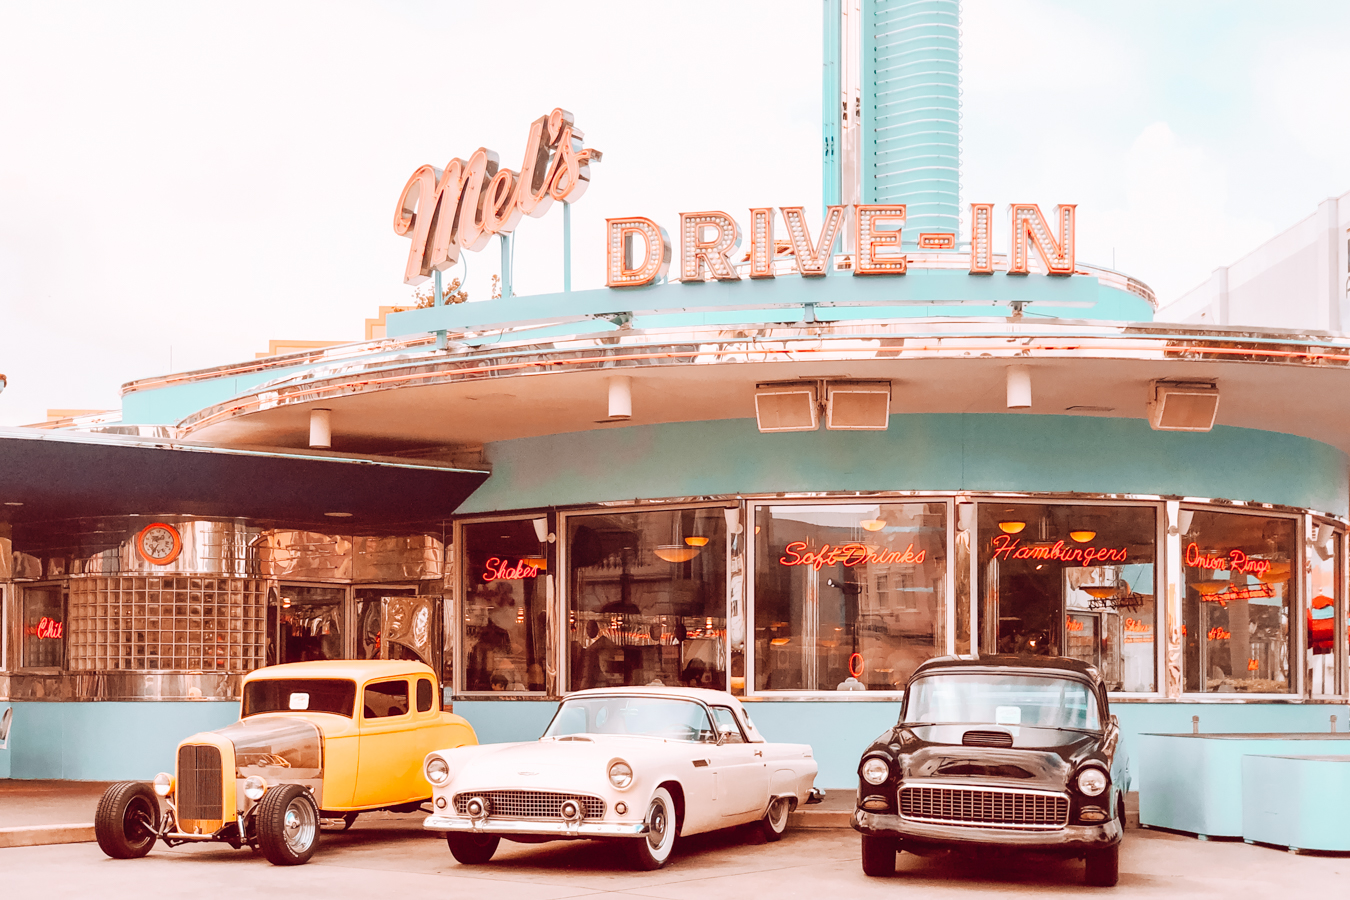 Mel's drive-in at Universal Studios Florida